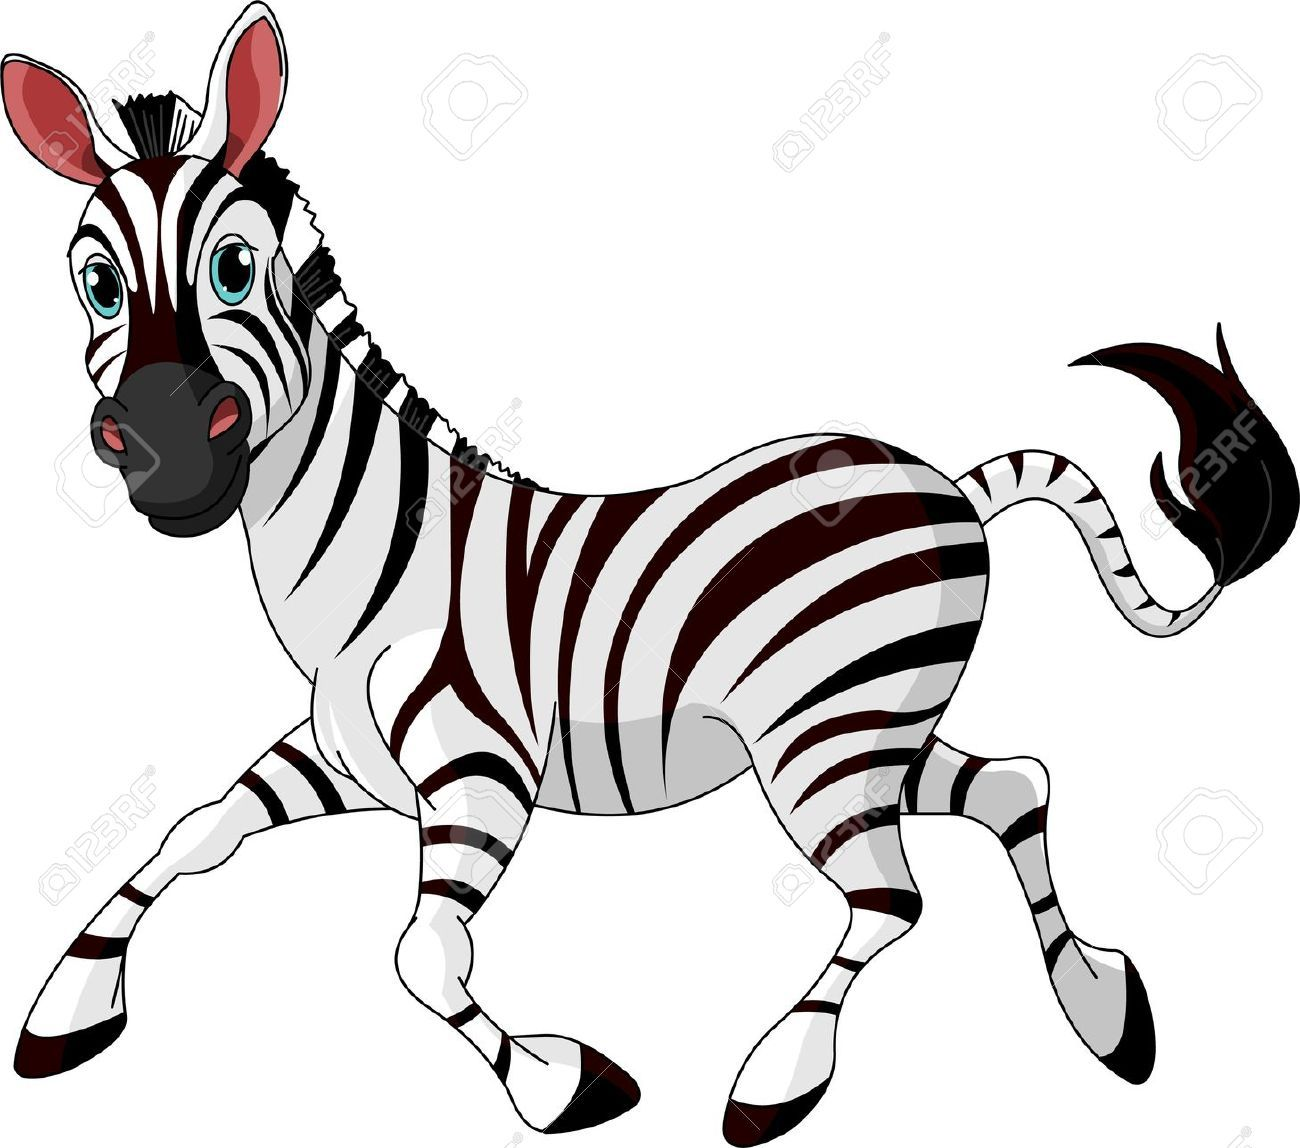 Image result for clipart images of zebra.